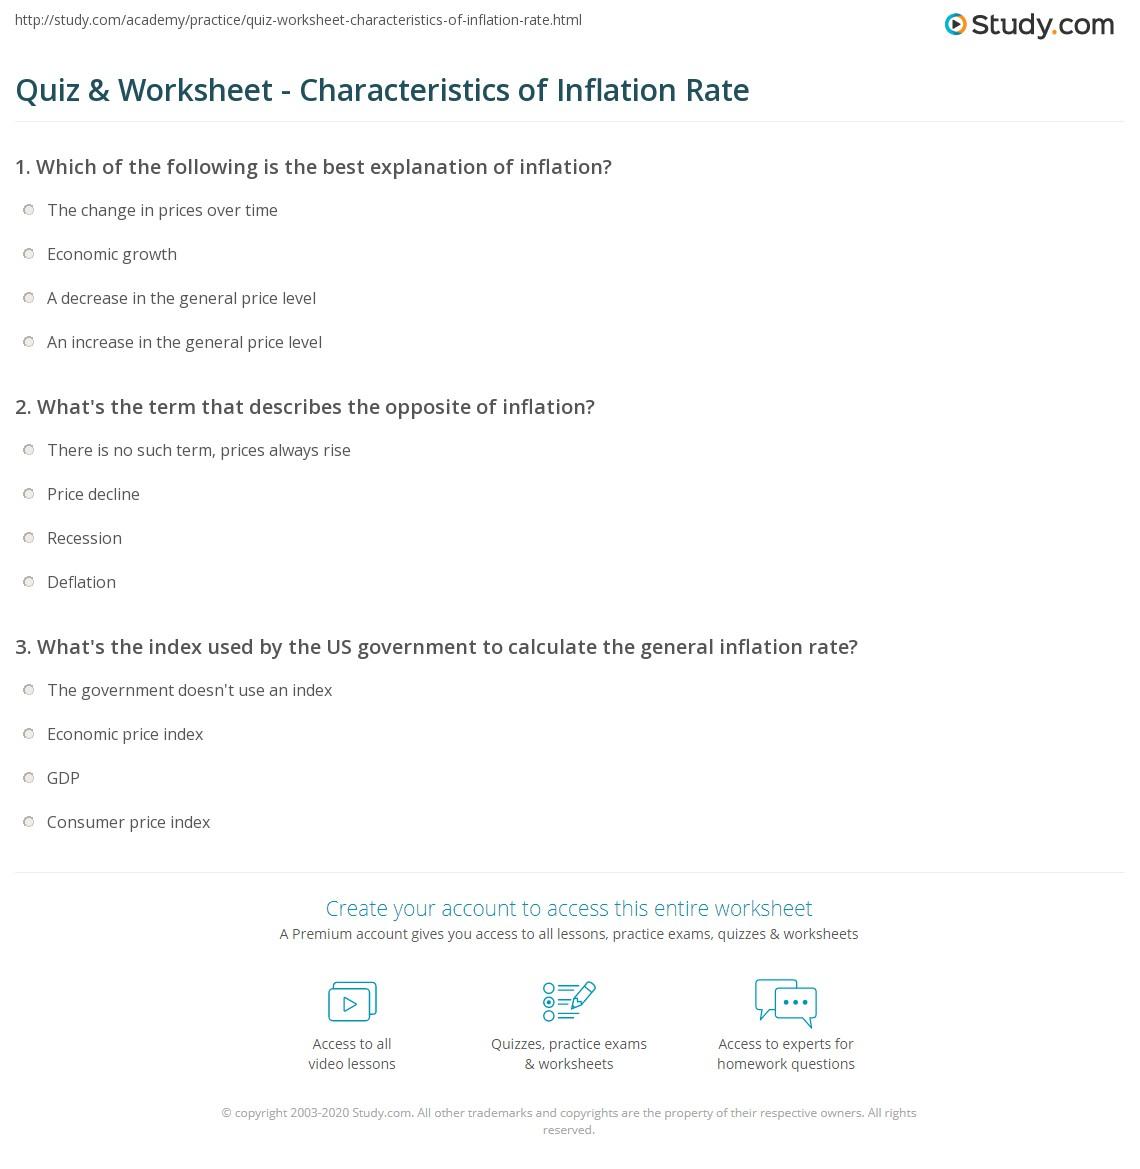 quiz worksheet characteristics of inflation rate. Black Bedroom Furniture Sets. Home Design Ideas